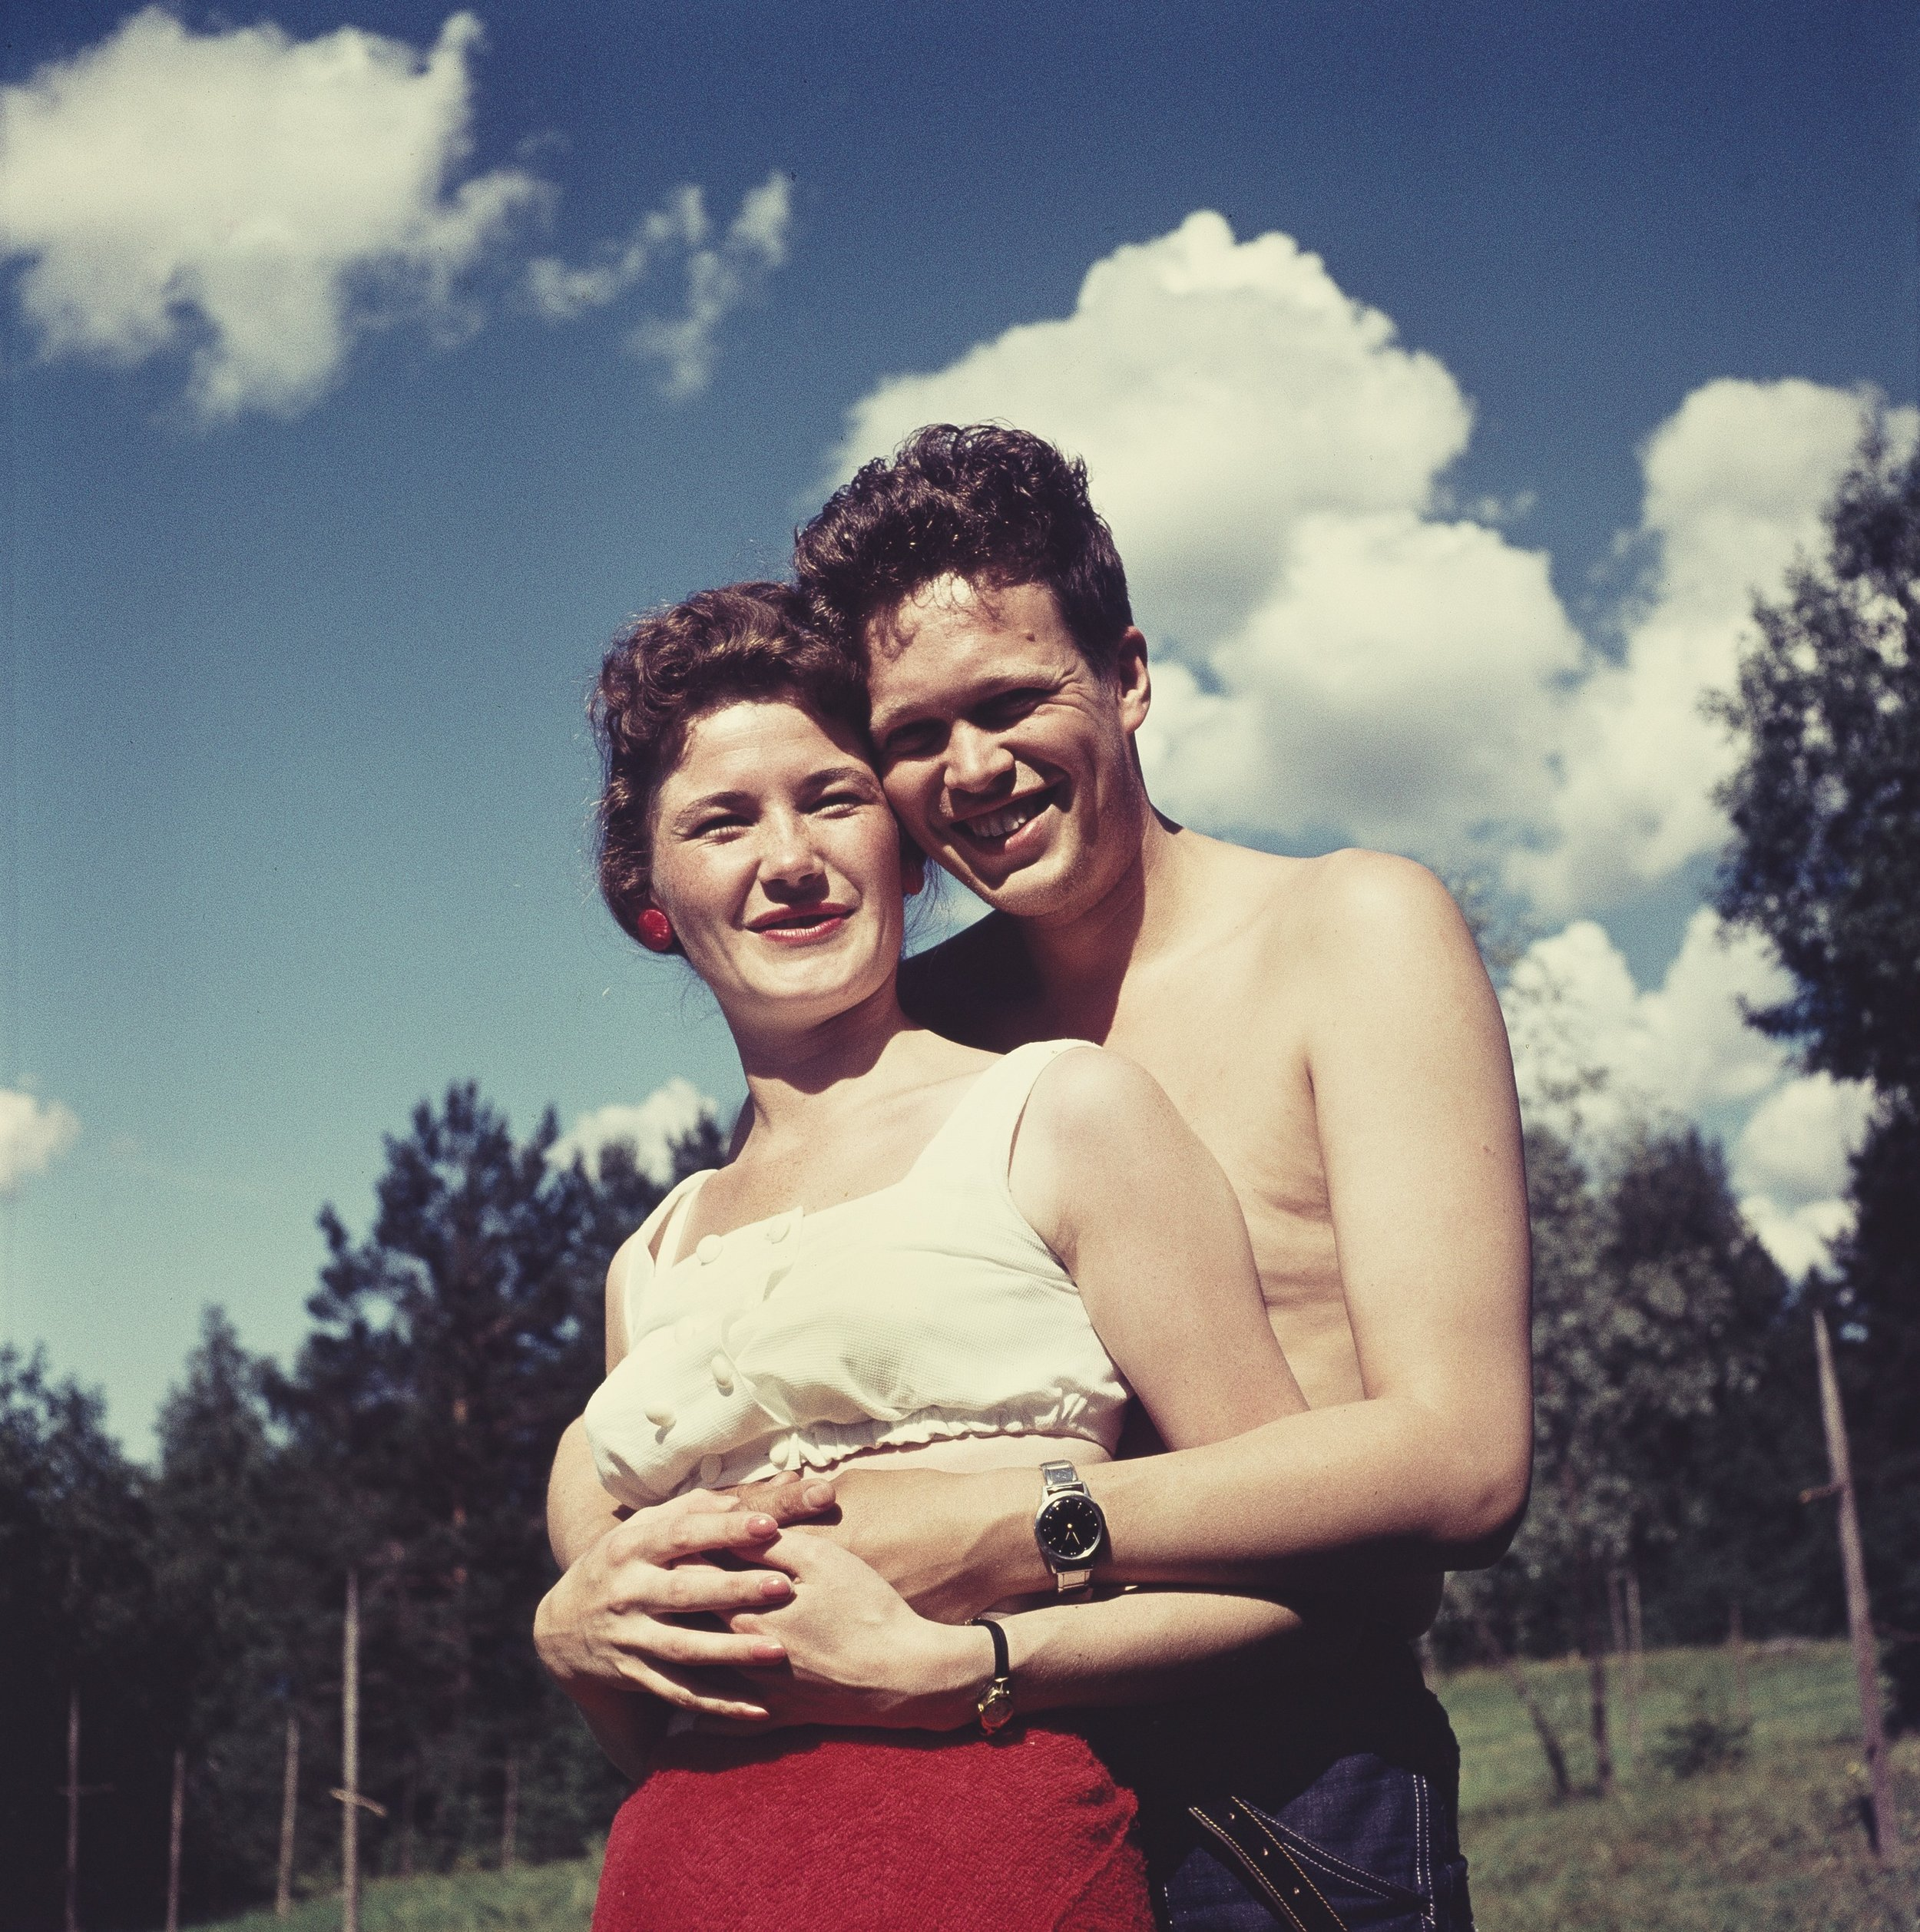 Pariskunta 1960-luvulla. Kuva: Juha Jernvall